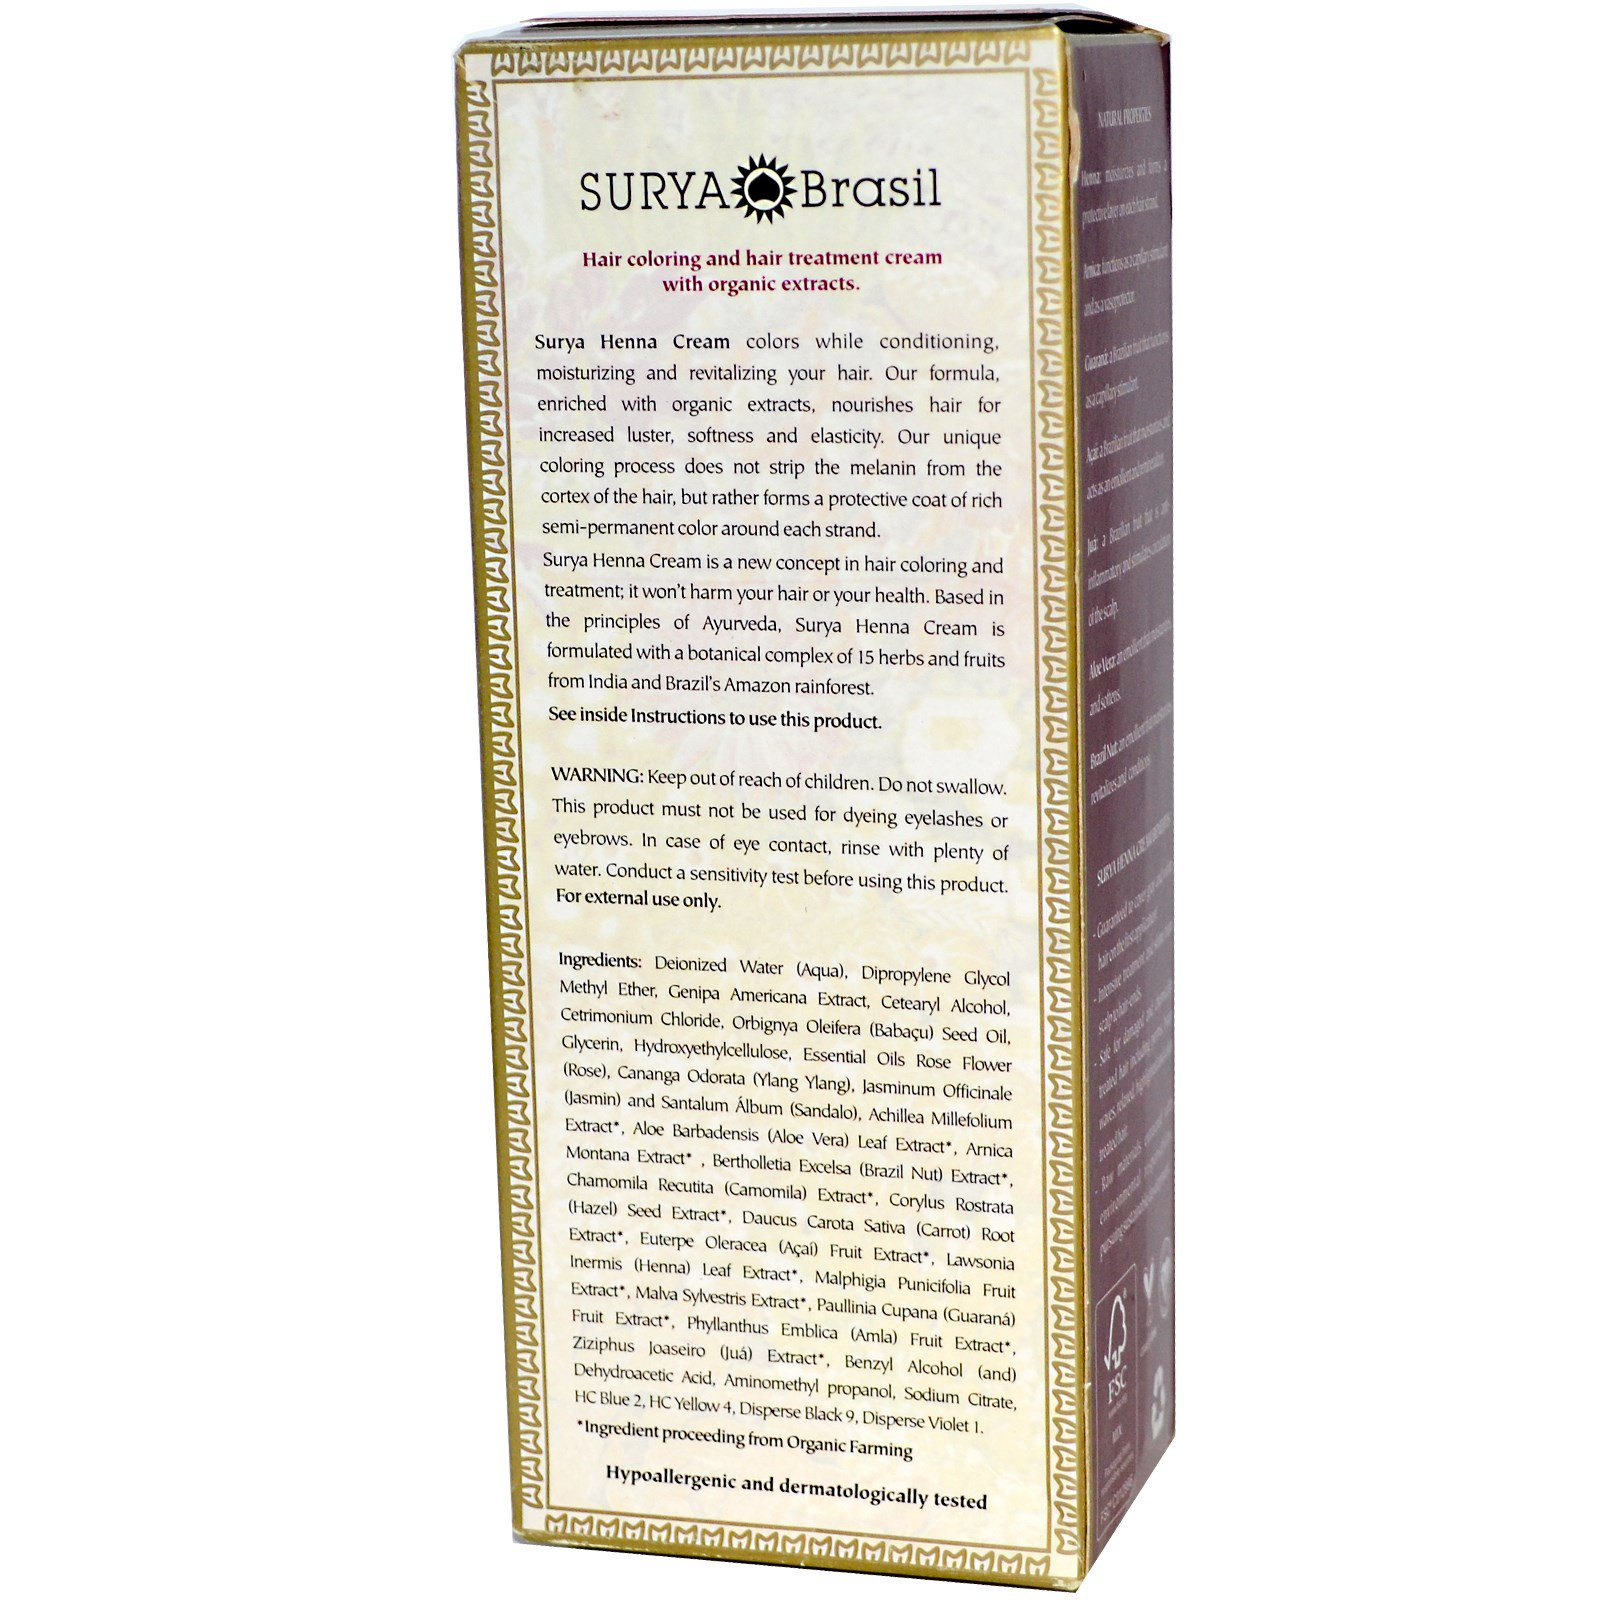 160cd03f0ffaf Surya Brasil, Henna Cream, Hair Coloring & Hair Treatment, Black, 2.31 fl oz  (70 ml) (Discontinued Item). By Surya Brasil